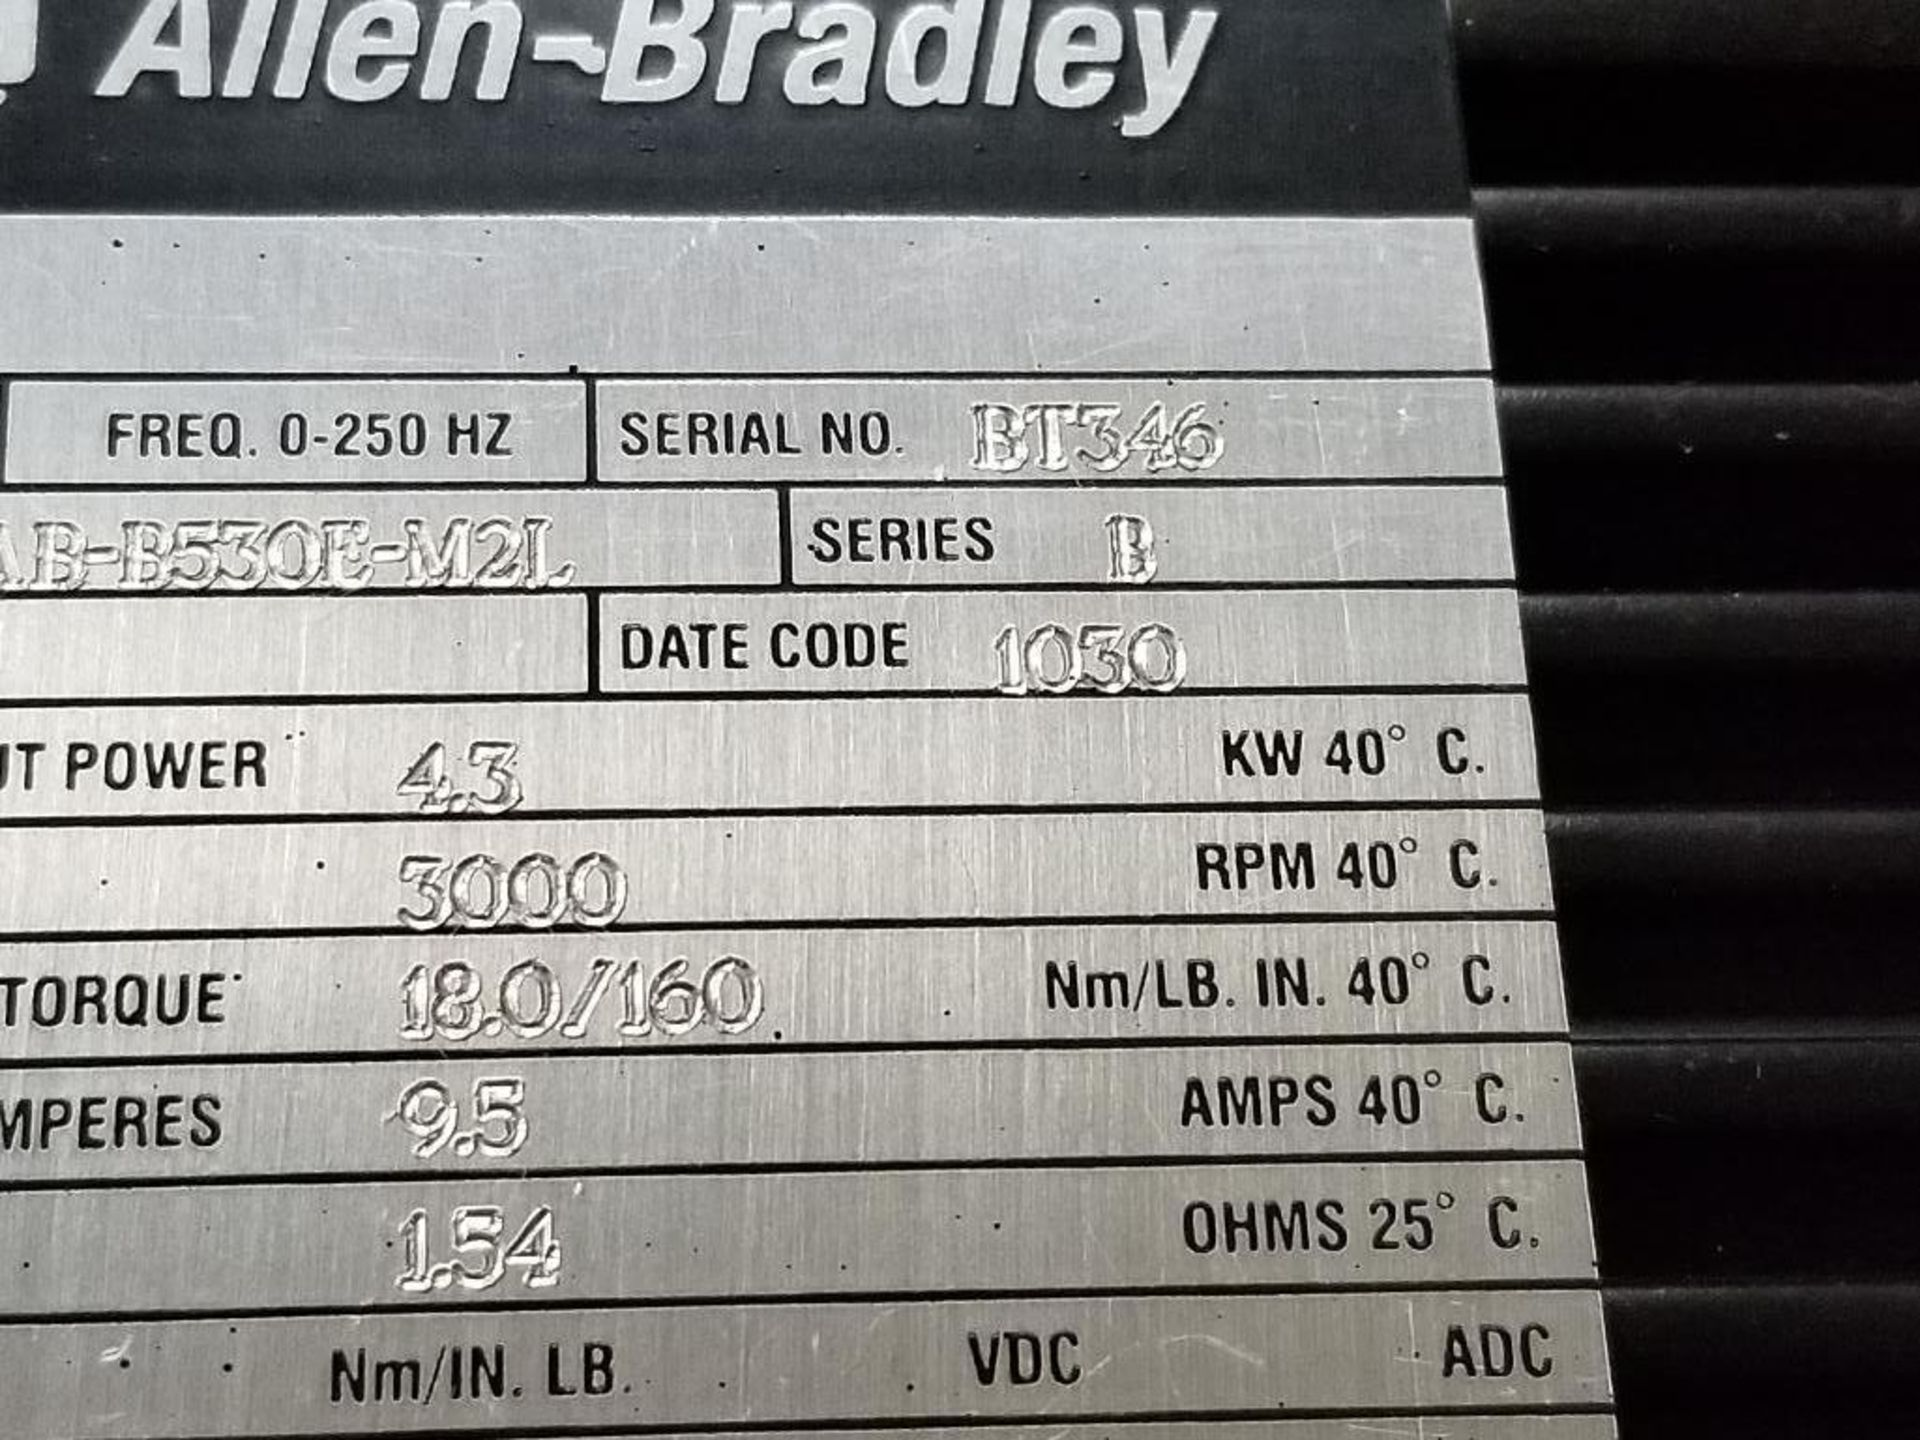 4.3kW Allen Bradley servo motor. 1326AB-B530E-M2L. 3PH, 460V, 3000RPM. - Image 3 of 4